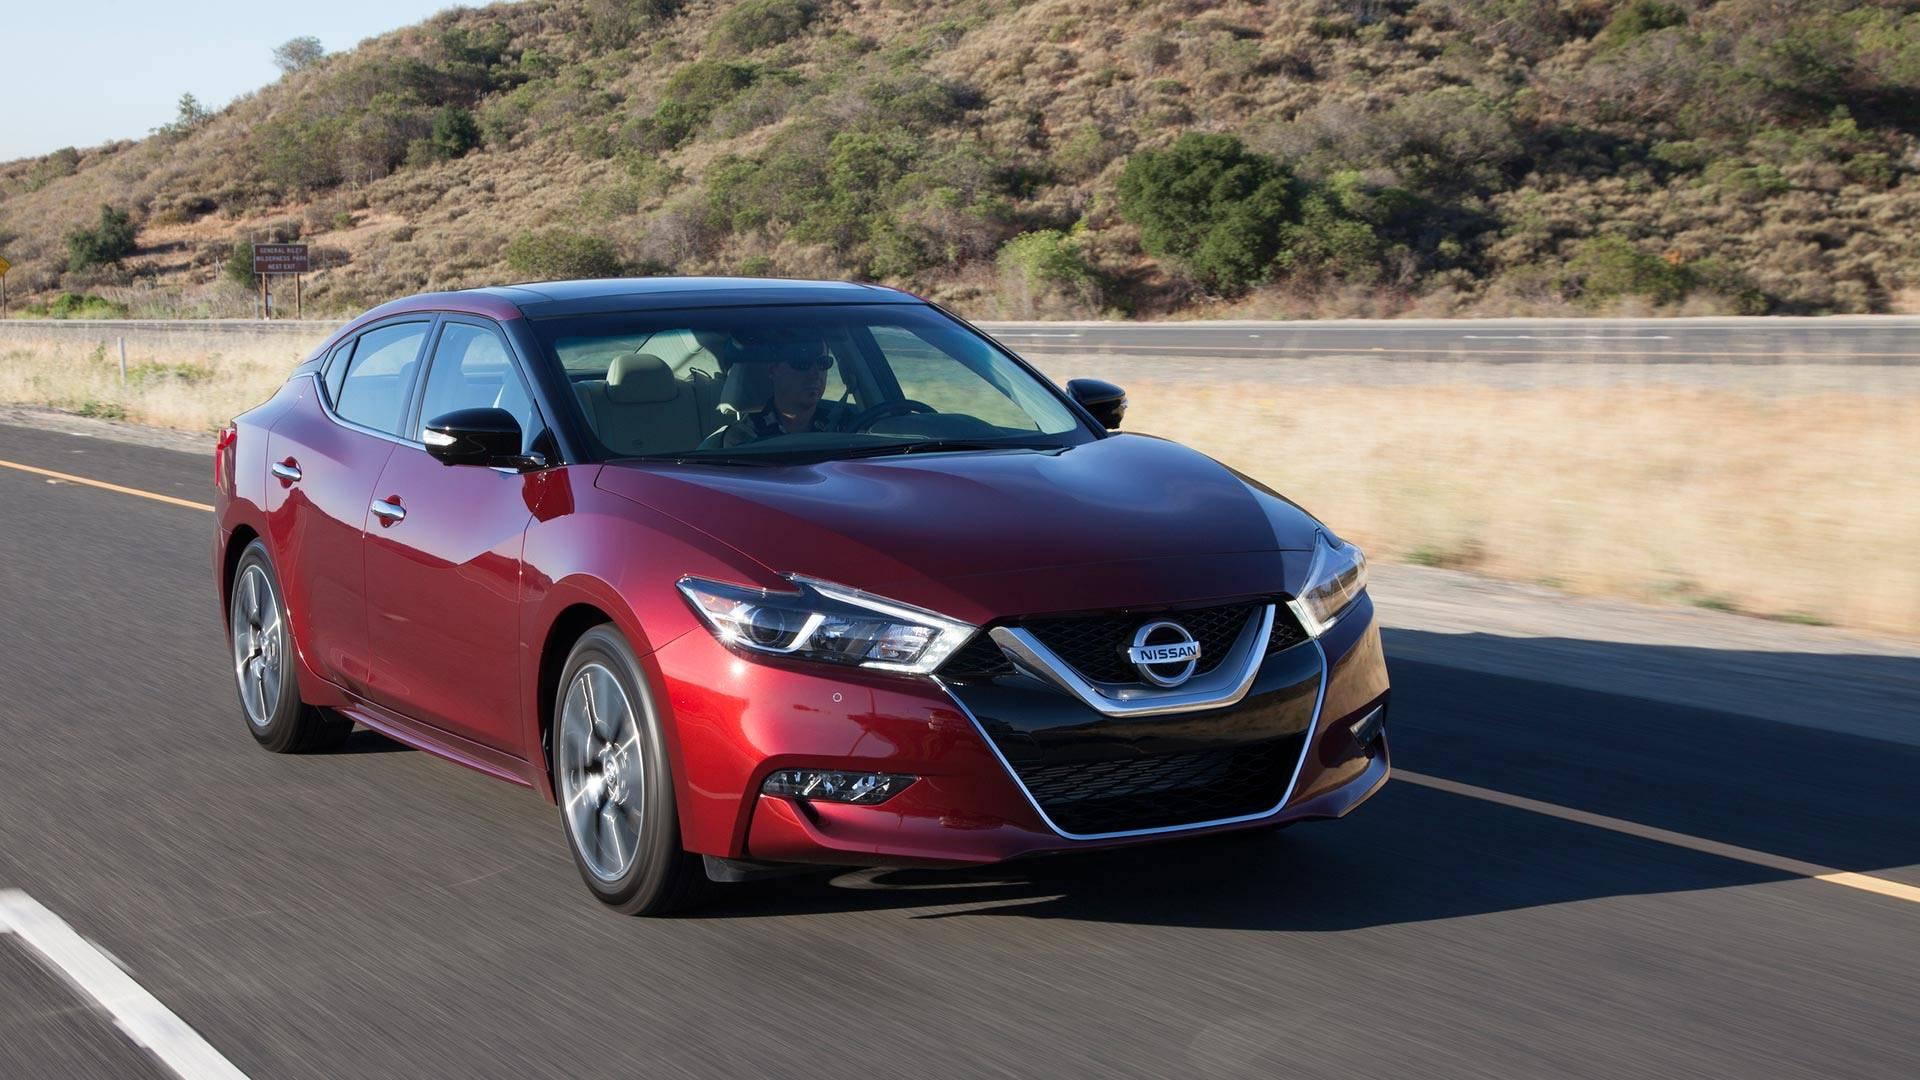 2018 Nissan Maxima Gets Minor Updates Price Increase